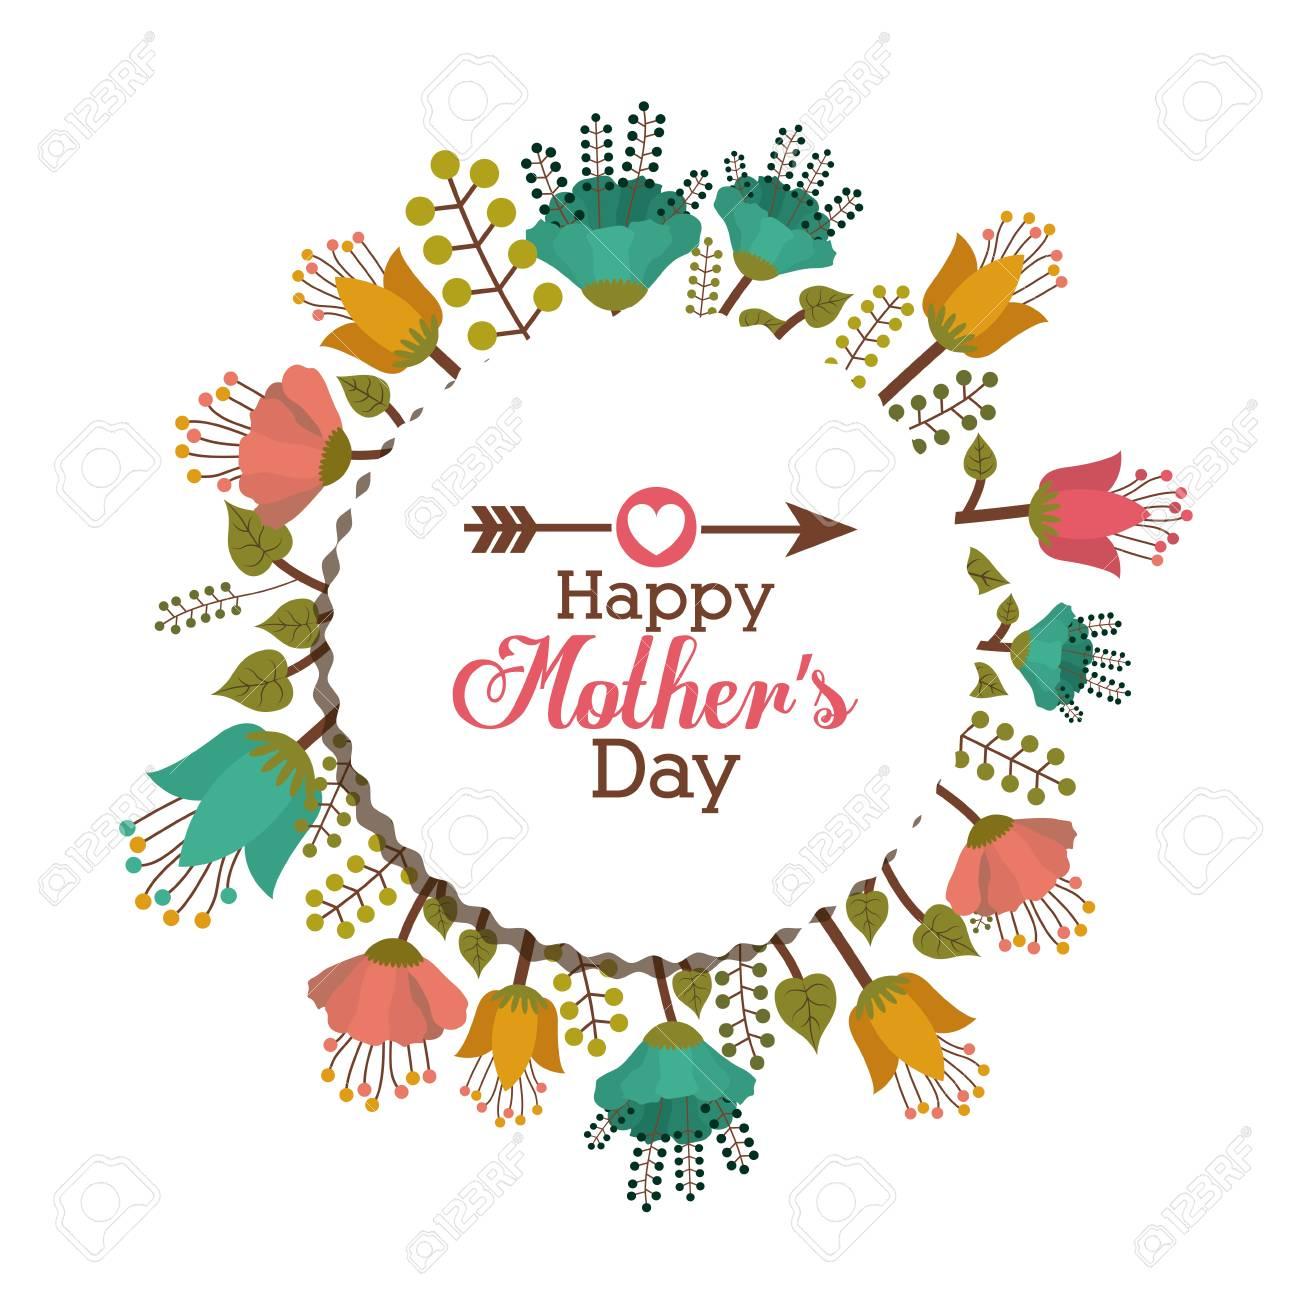 Mothers day design over white background, vector illustration - 39170674